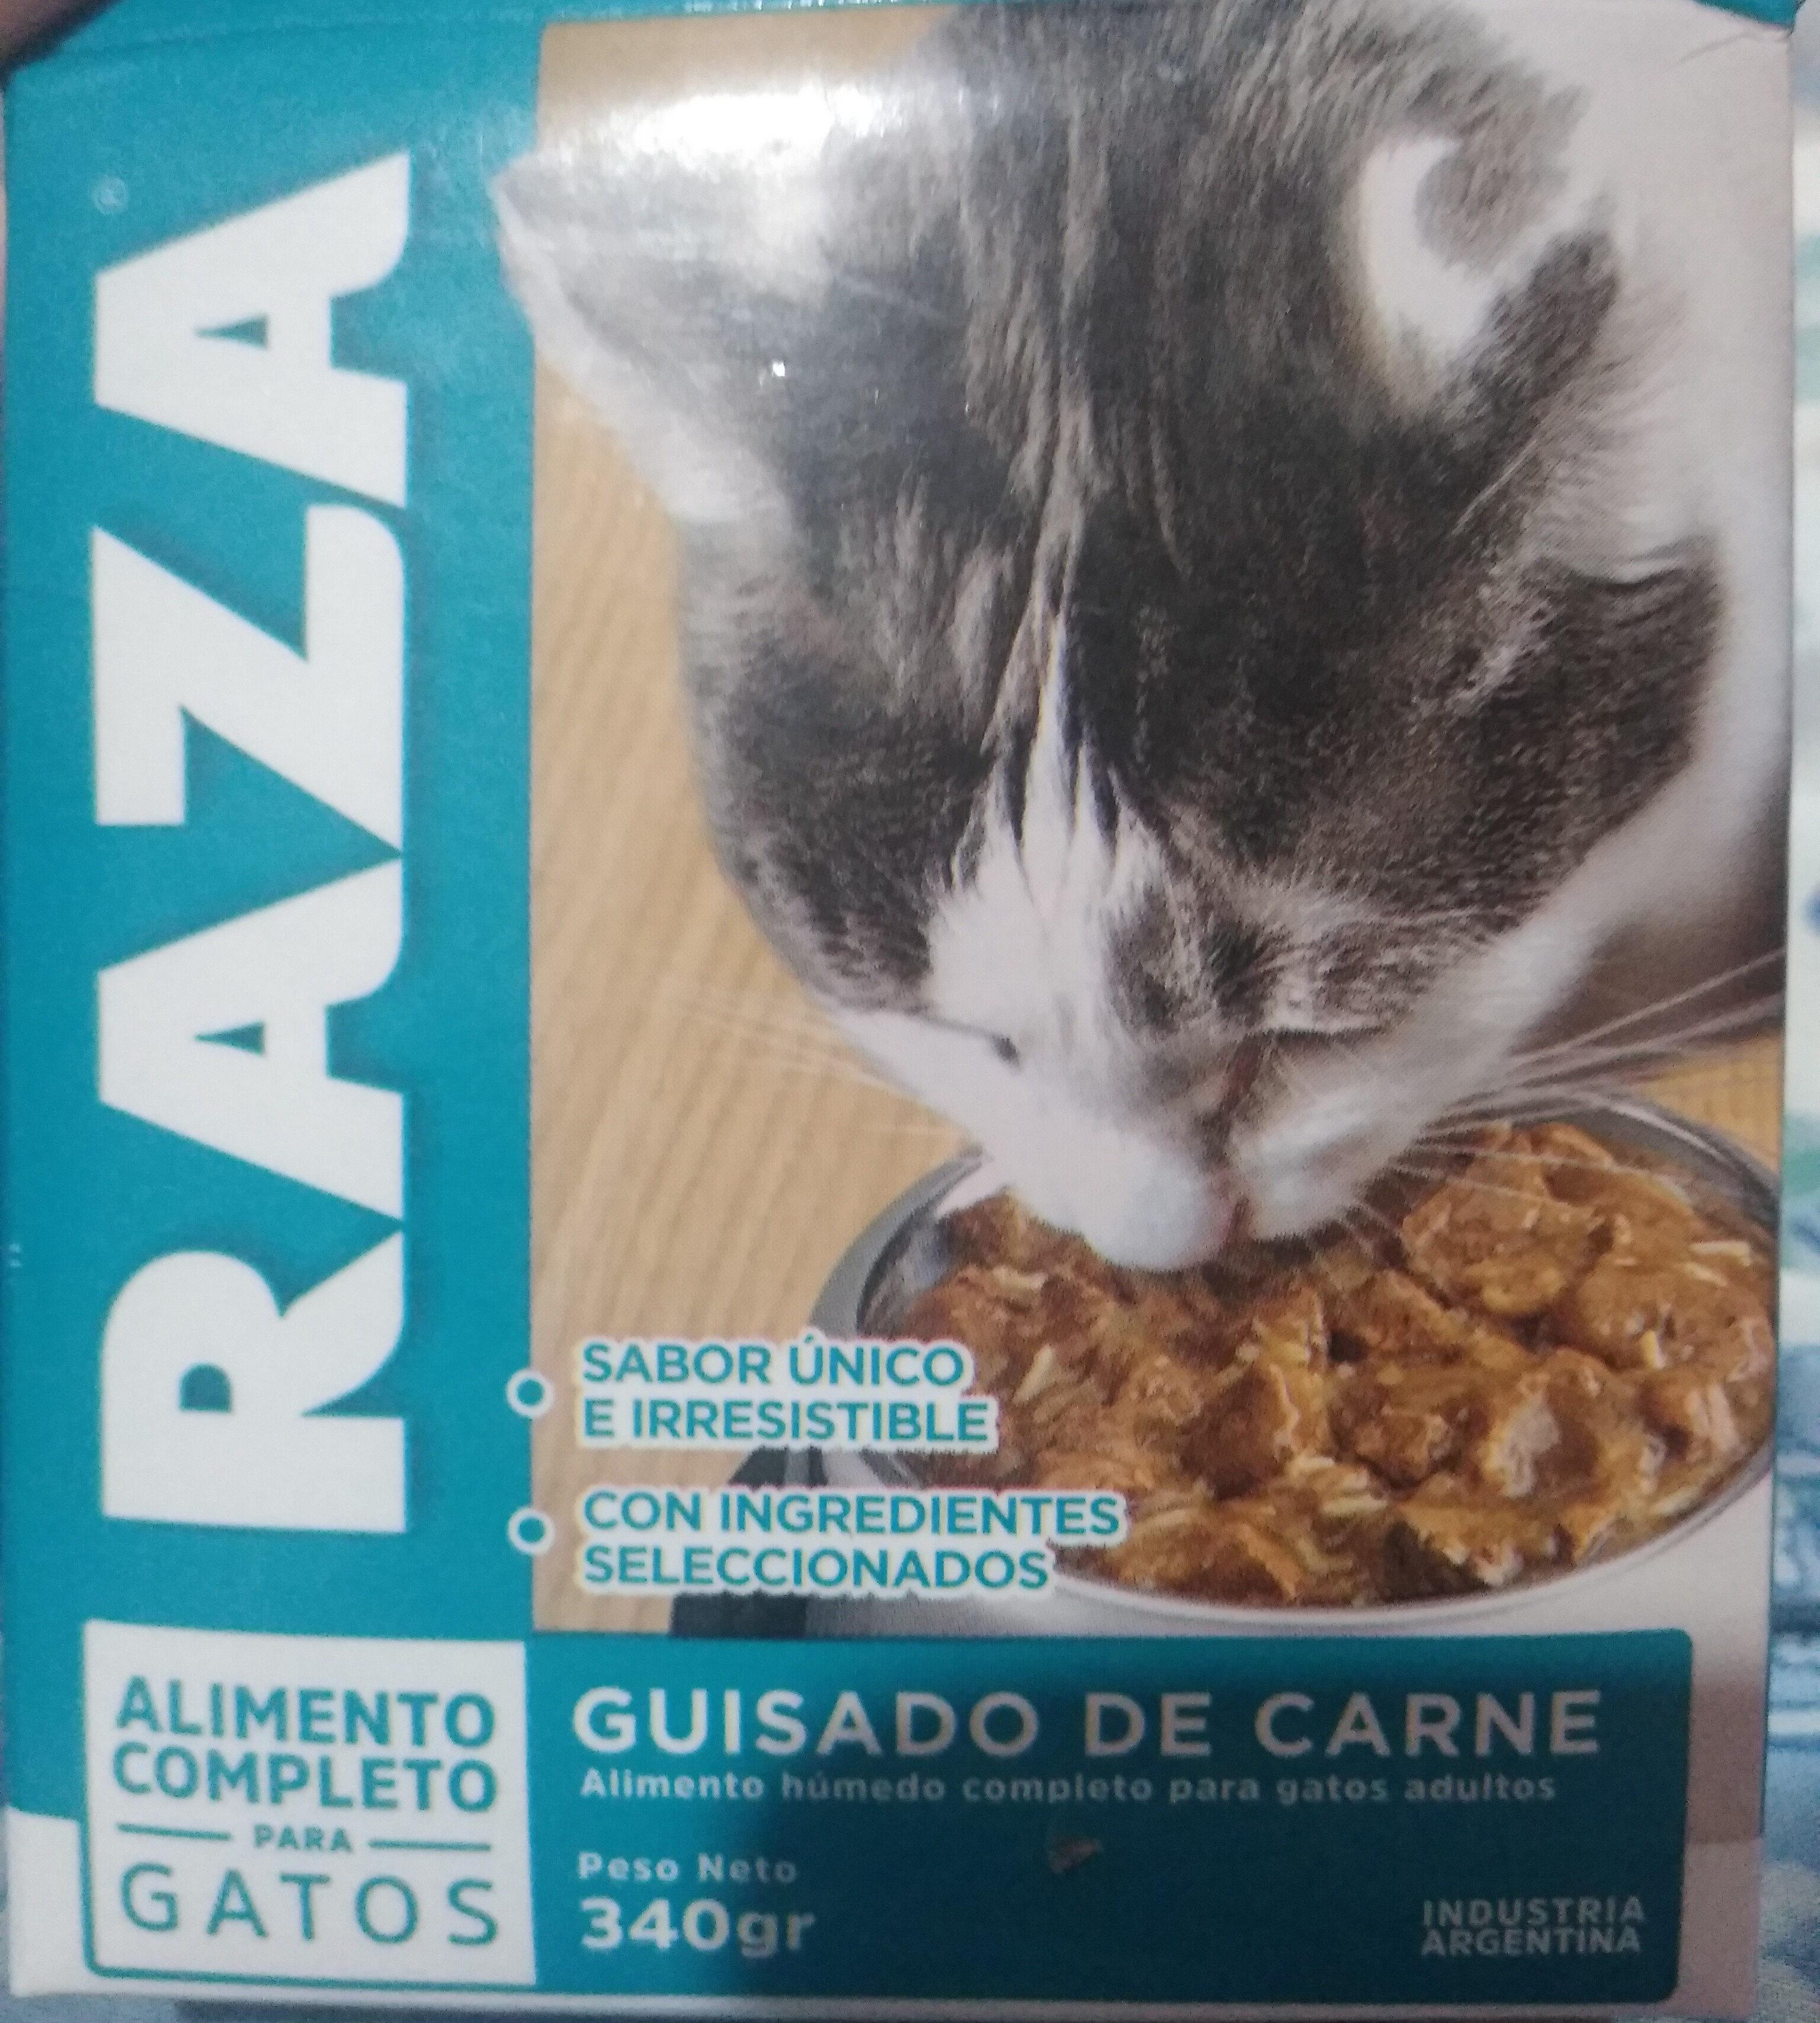 RAZA - ALIMENTO COMPLETO PARA GATOS - Product - es